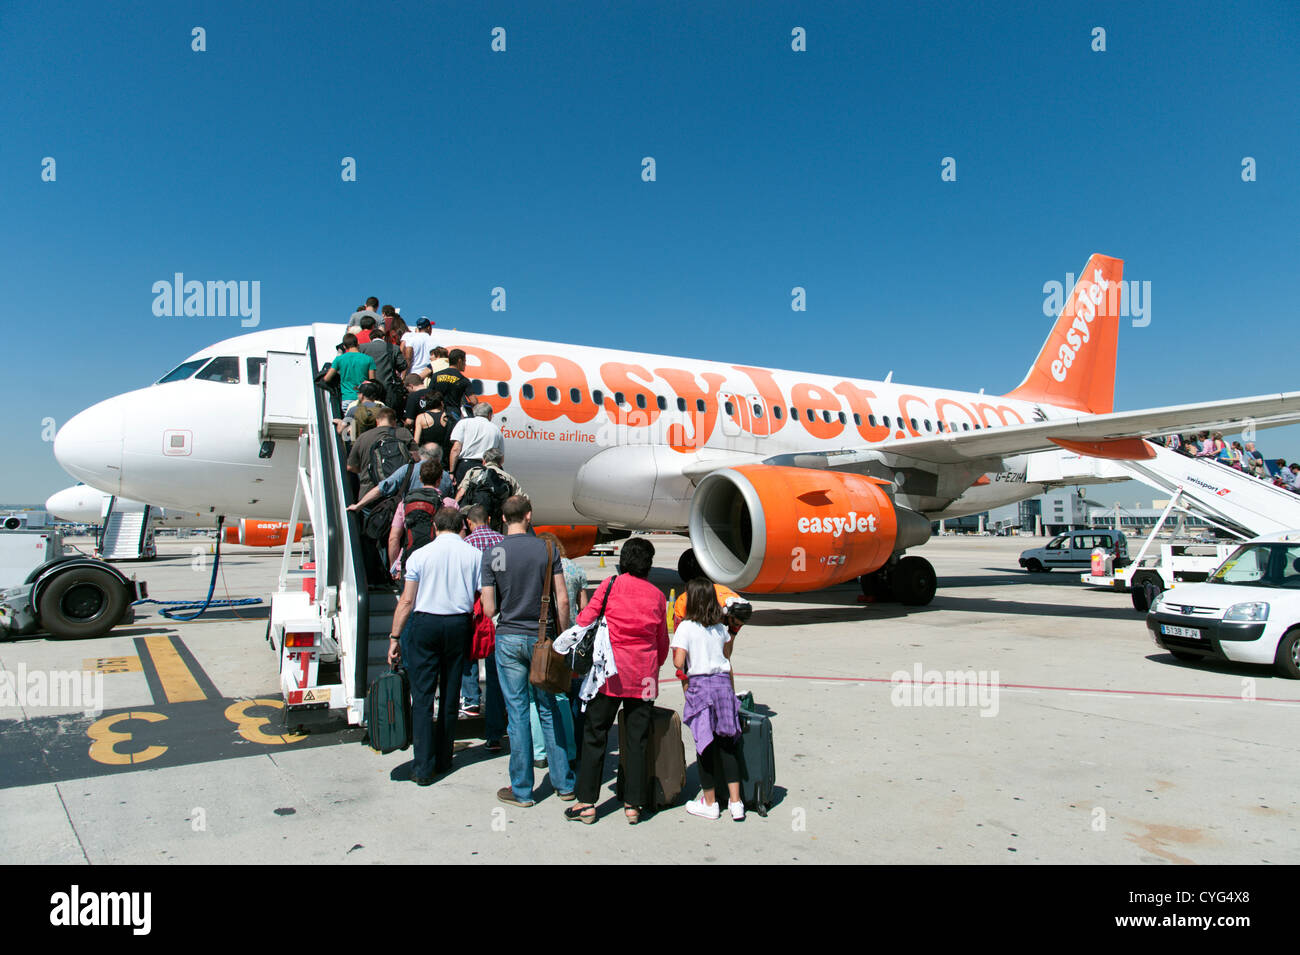 Passengers boarding Easyjet plane, Spain - Stock Image